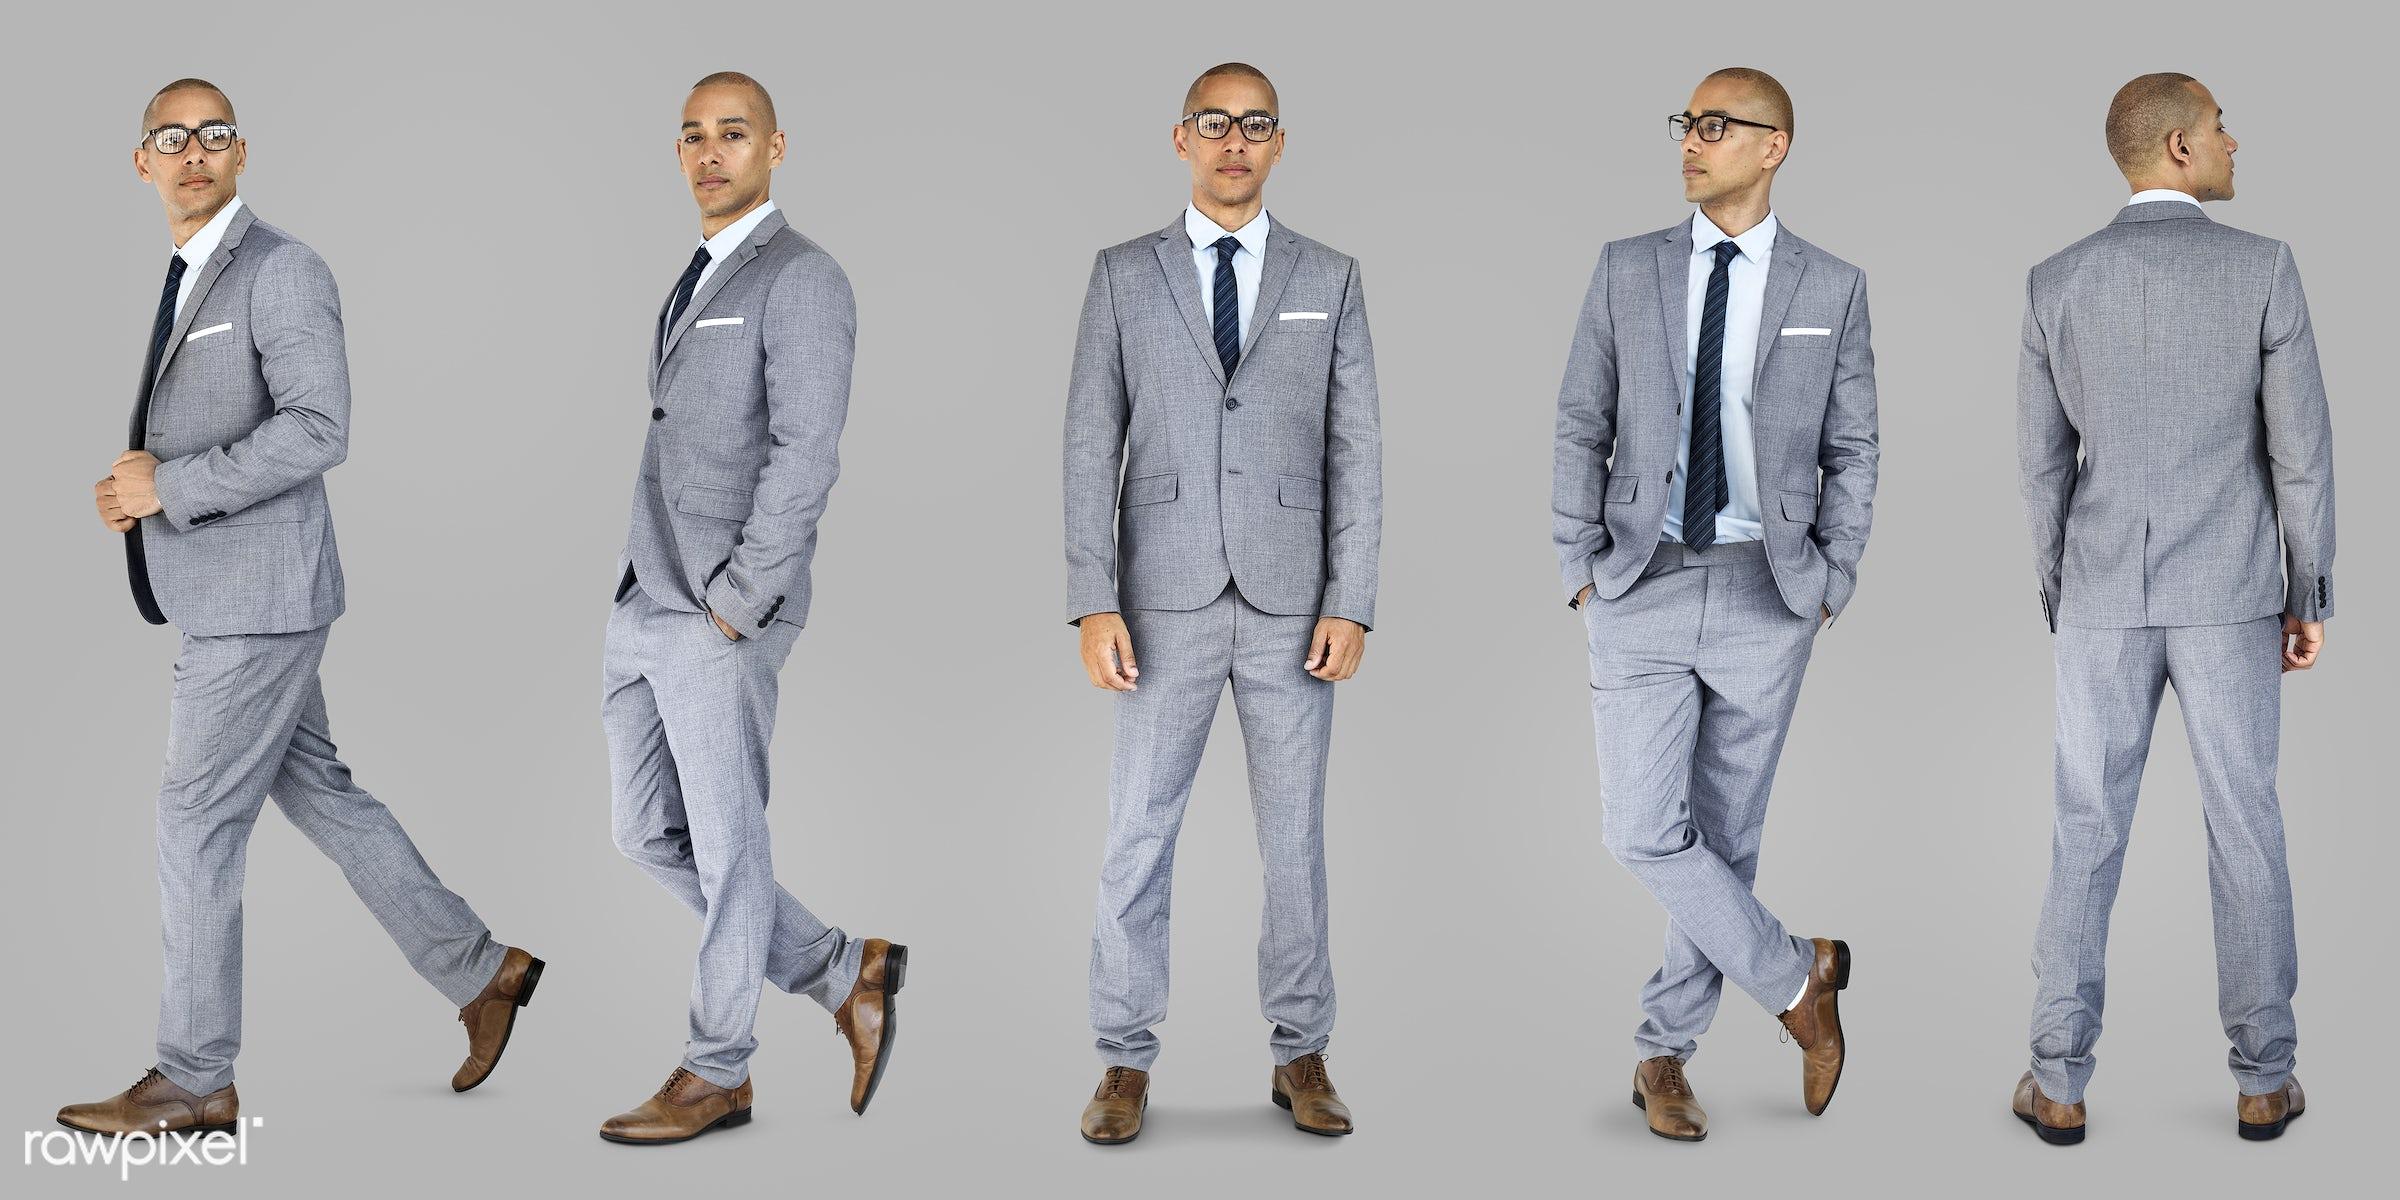 adult, assistant, attractive, business, businessman, businessmen, businessperson, career, caucasian, confidence, confident,...